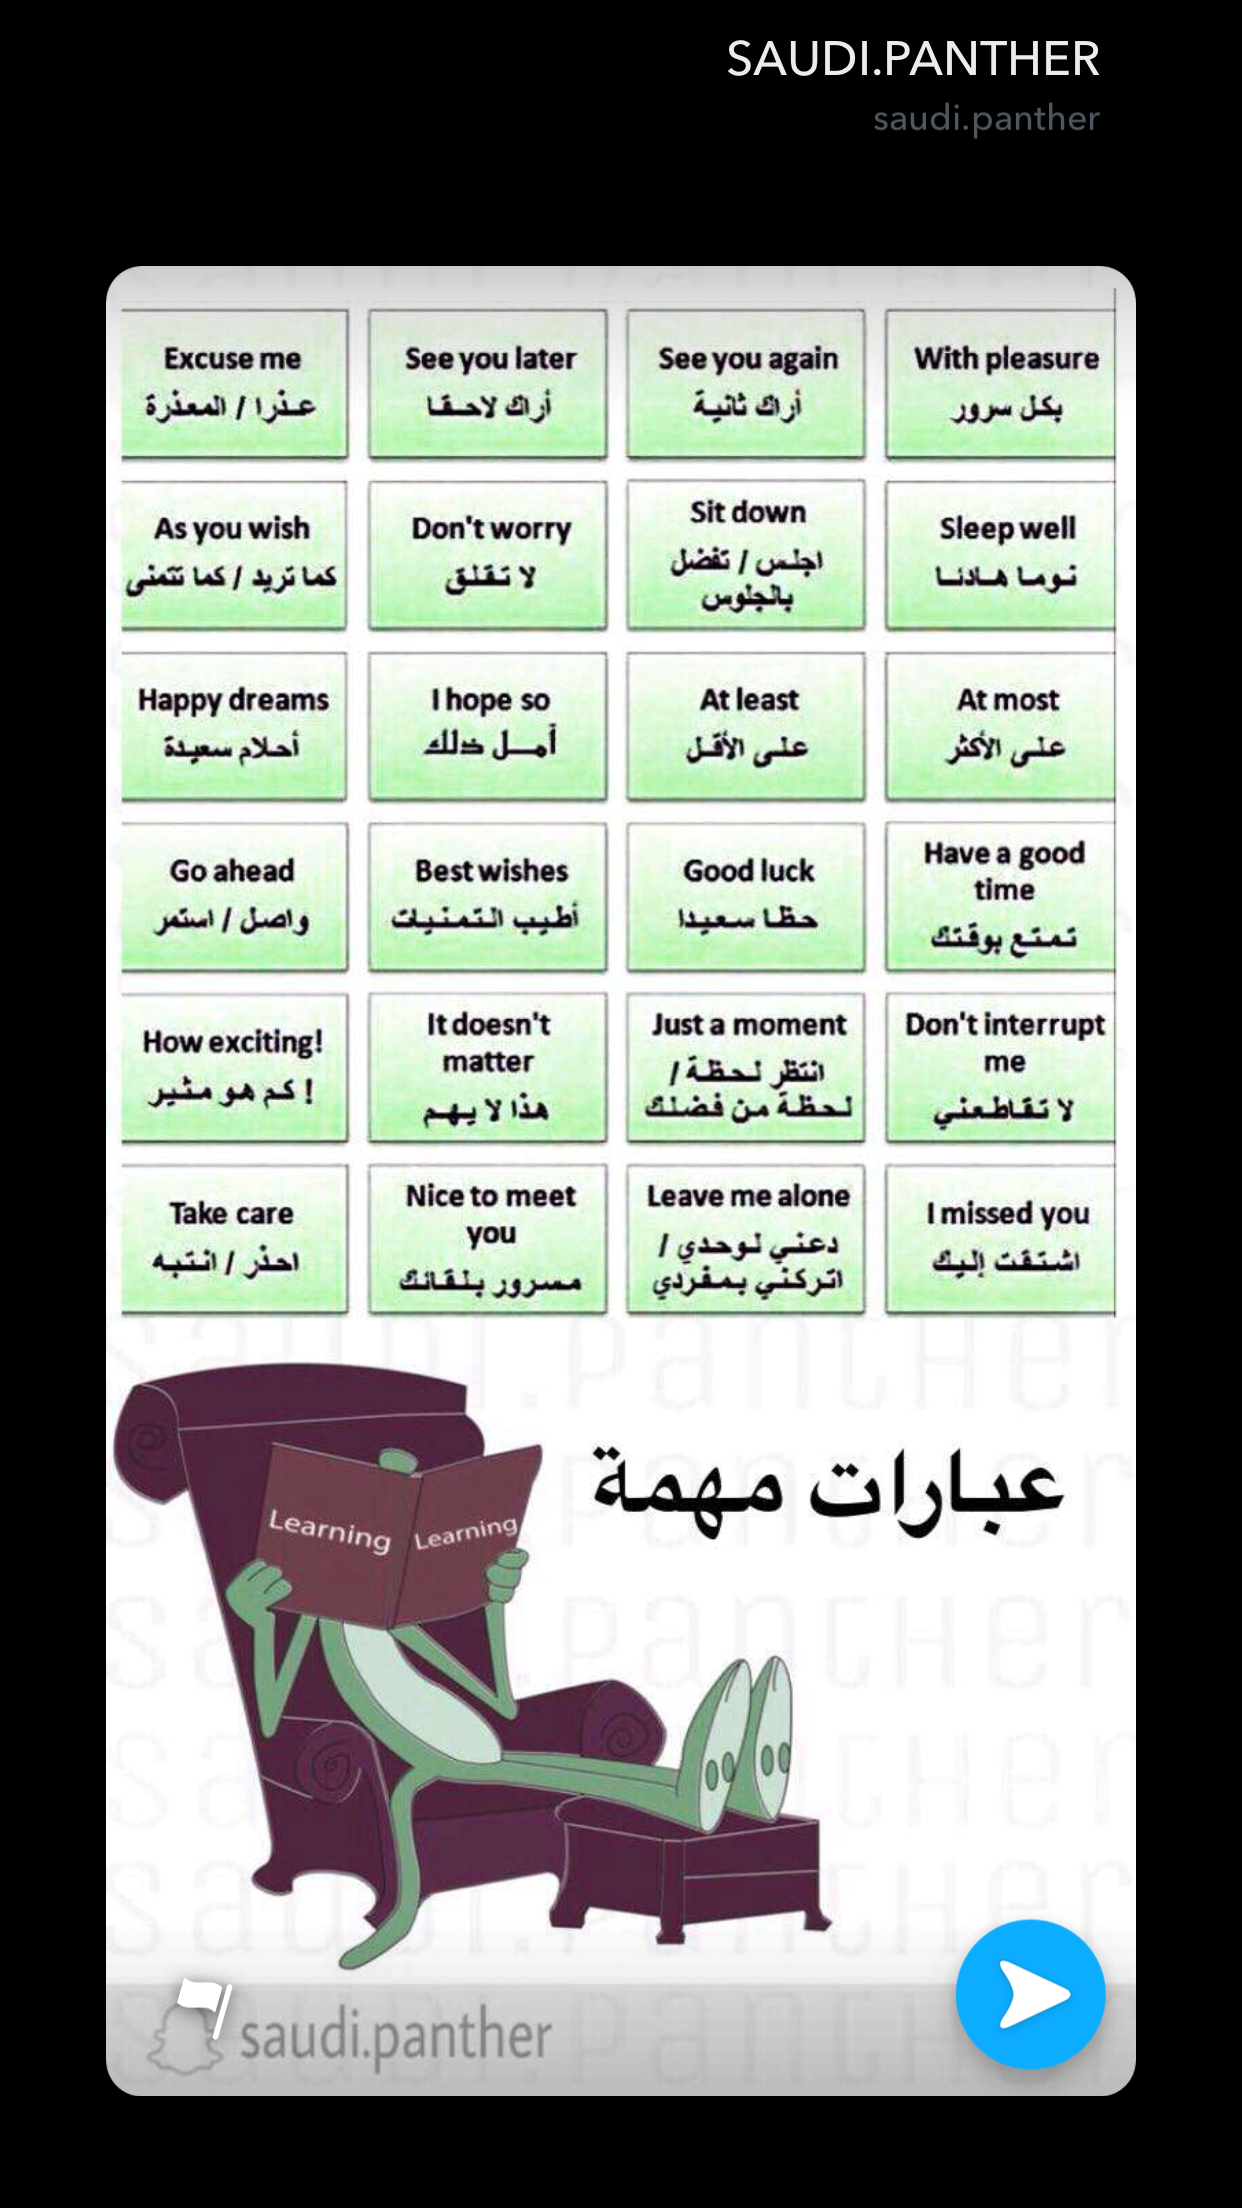 Learning Arabic Msa Fabiennem English Language Learning English Language Learning Grammar English Language Teaching